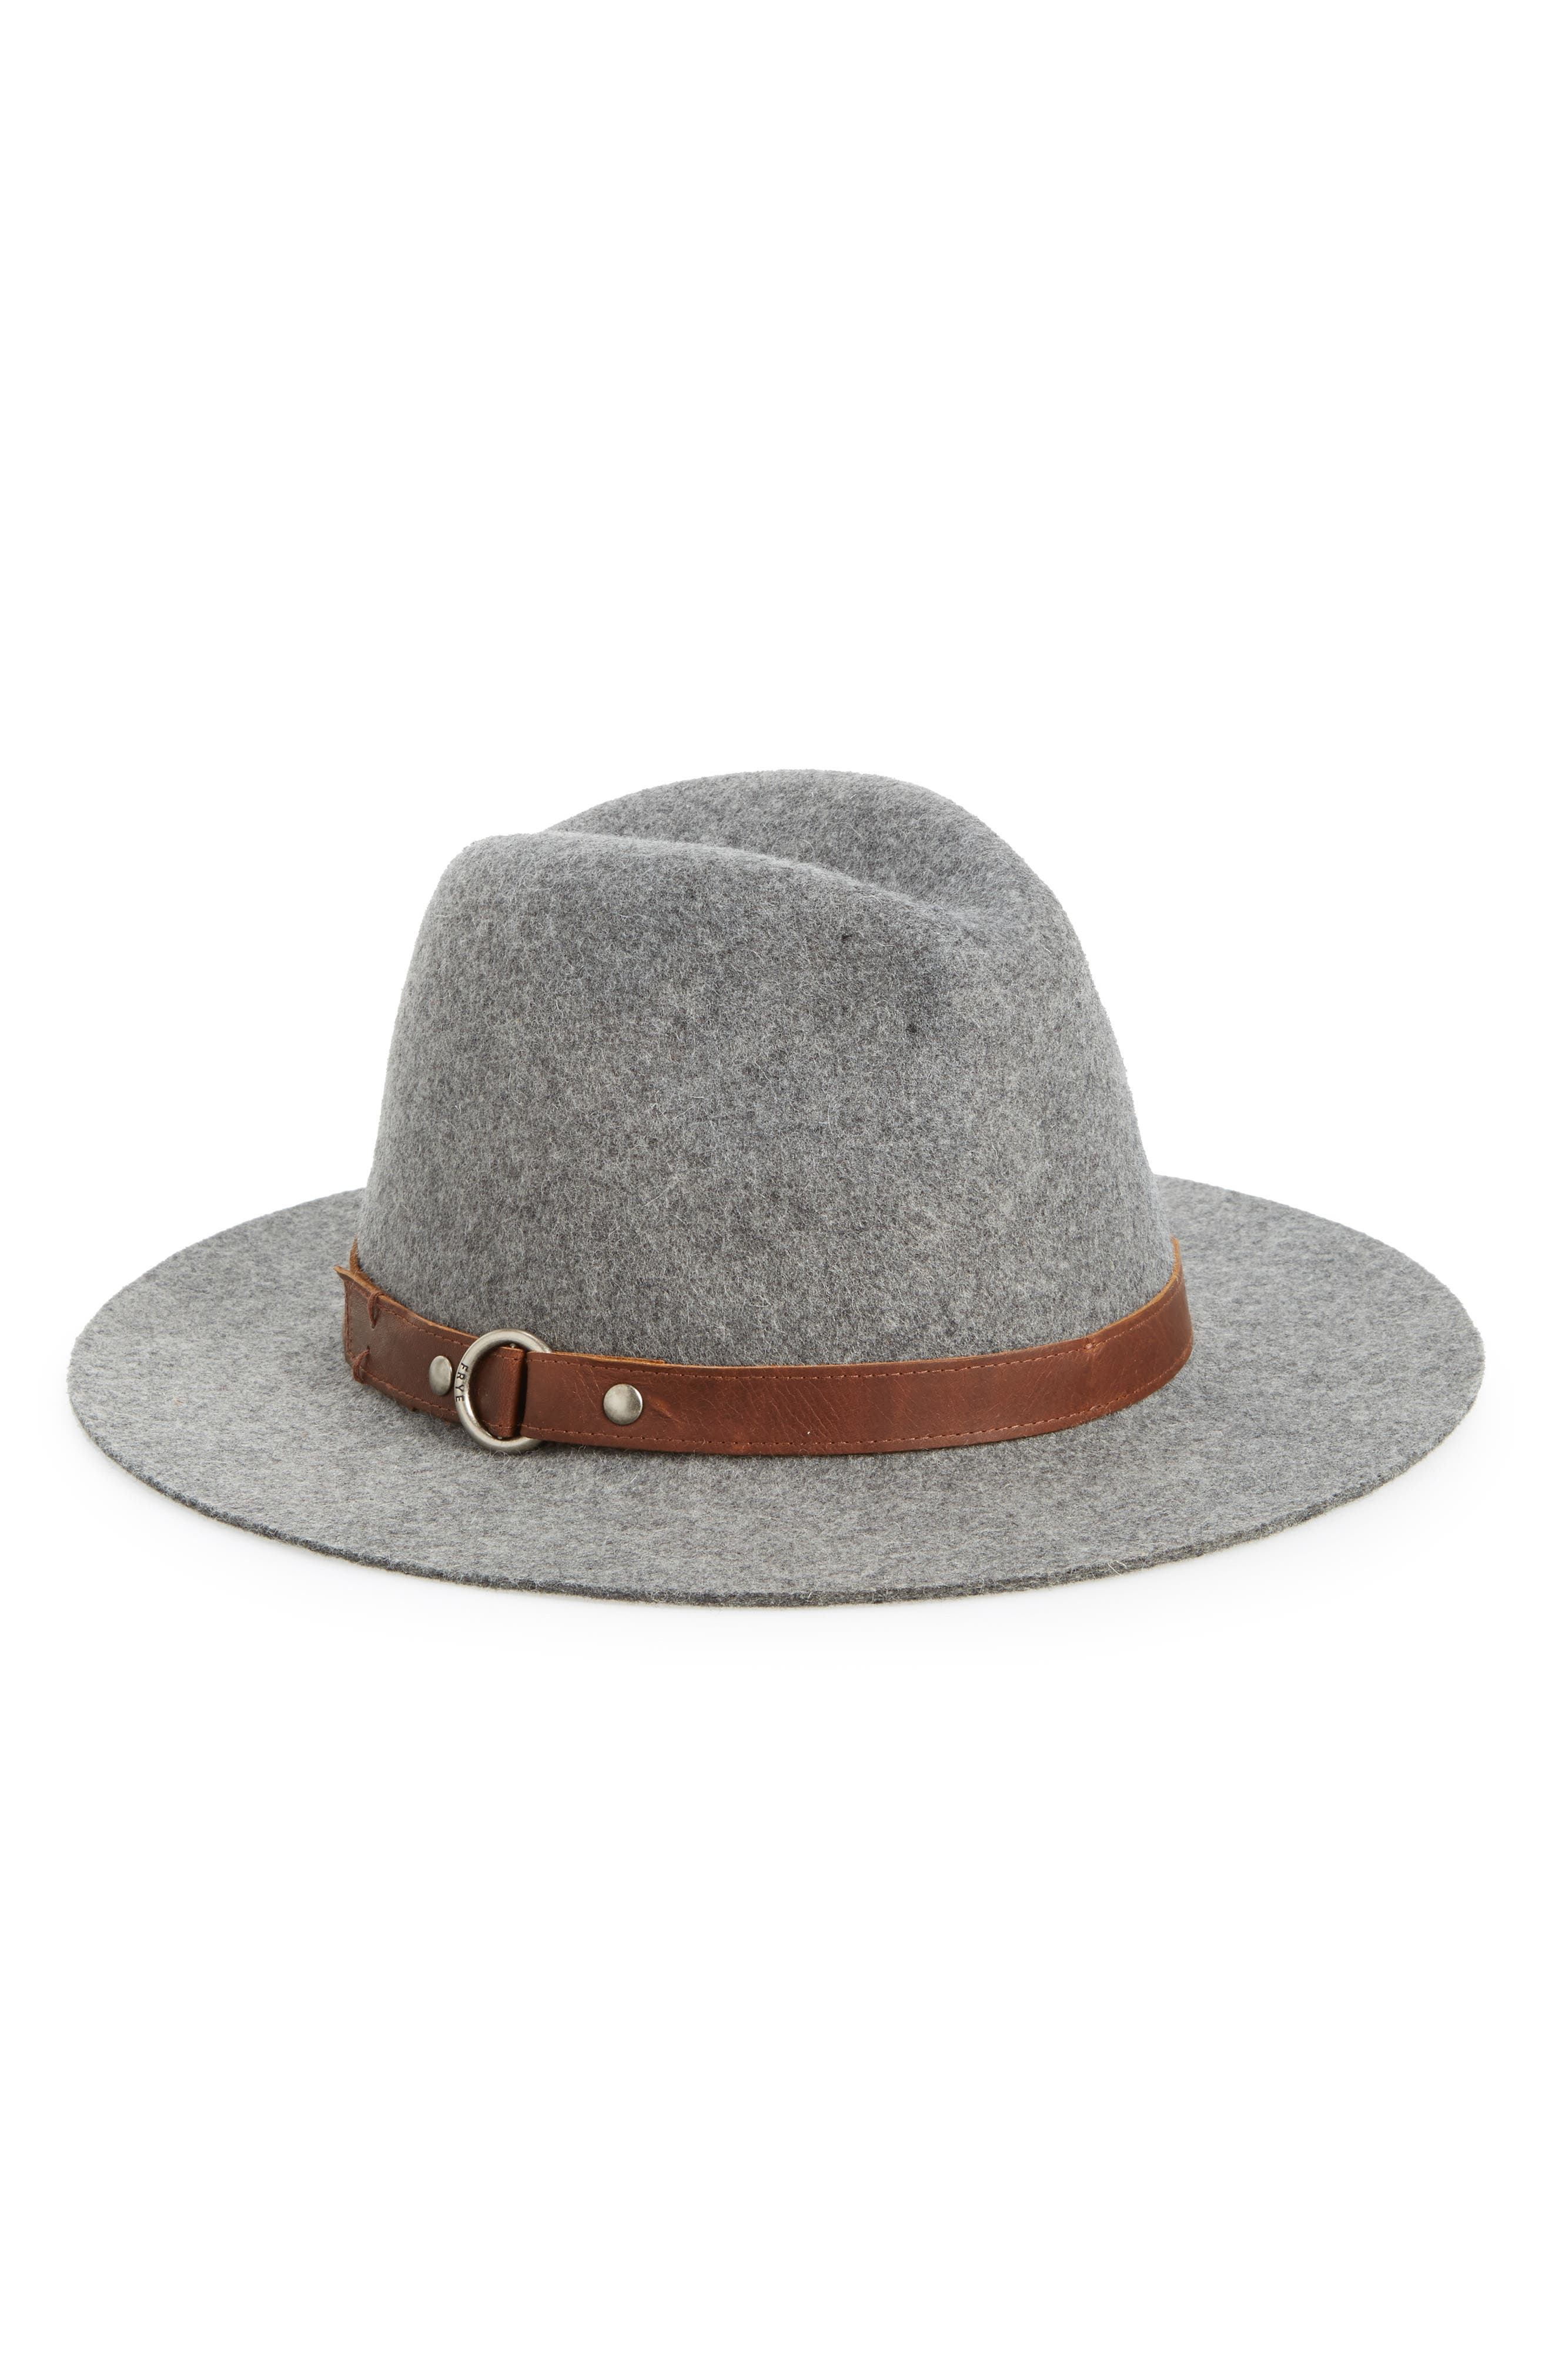 Harness Wool Felt Panama Hat,                         Main,                         color, GRAY